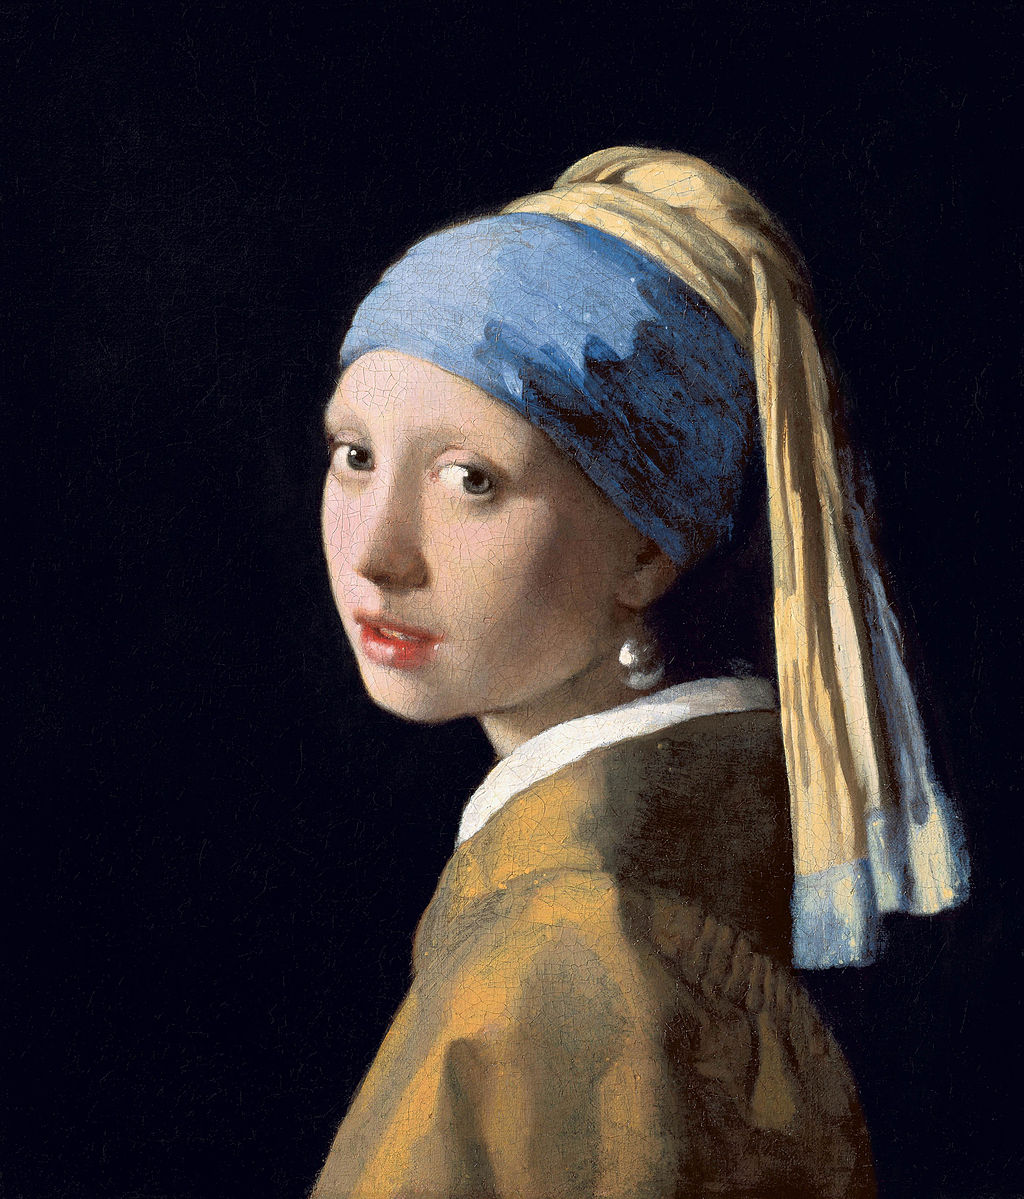 Art History's 6 Most Legendary Portraits - The KAZoART Contemporary Art Blog